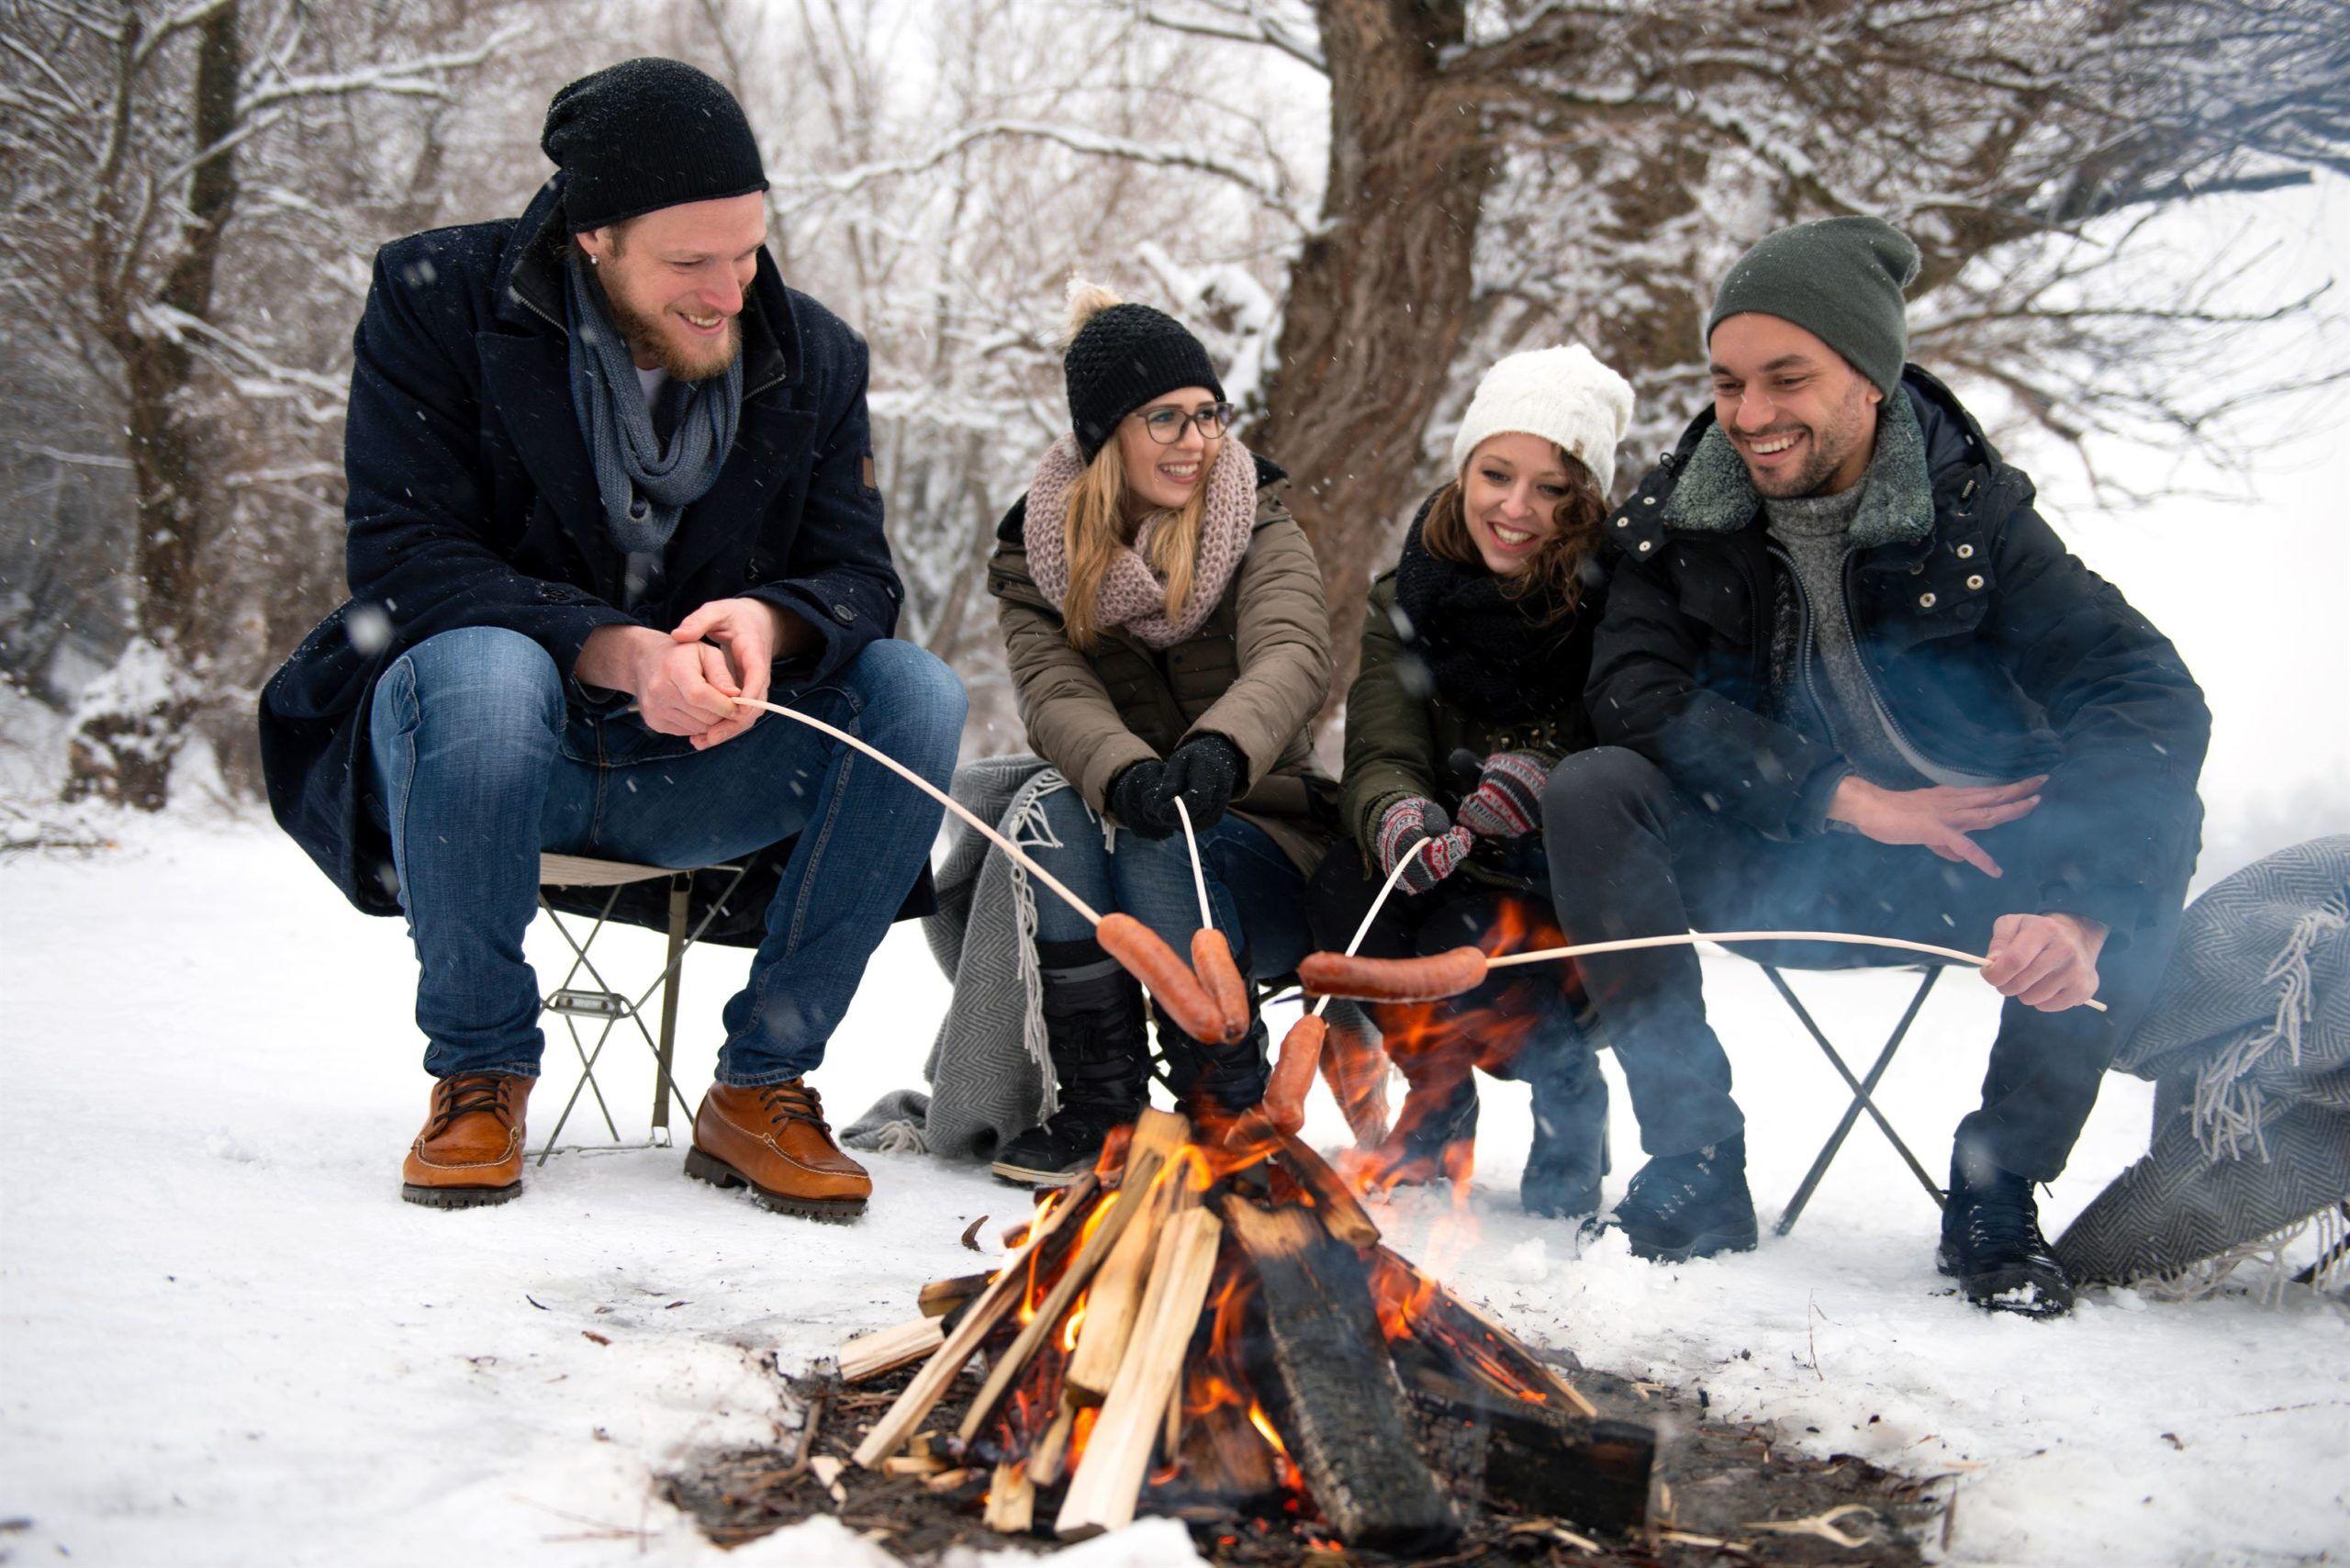 Winter grillen - Bild: Stock Rocket Shutterstock.com